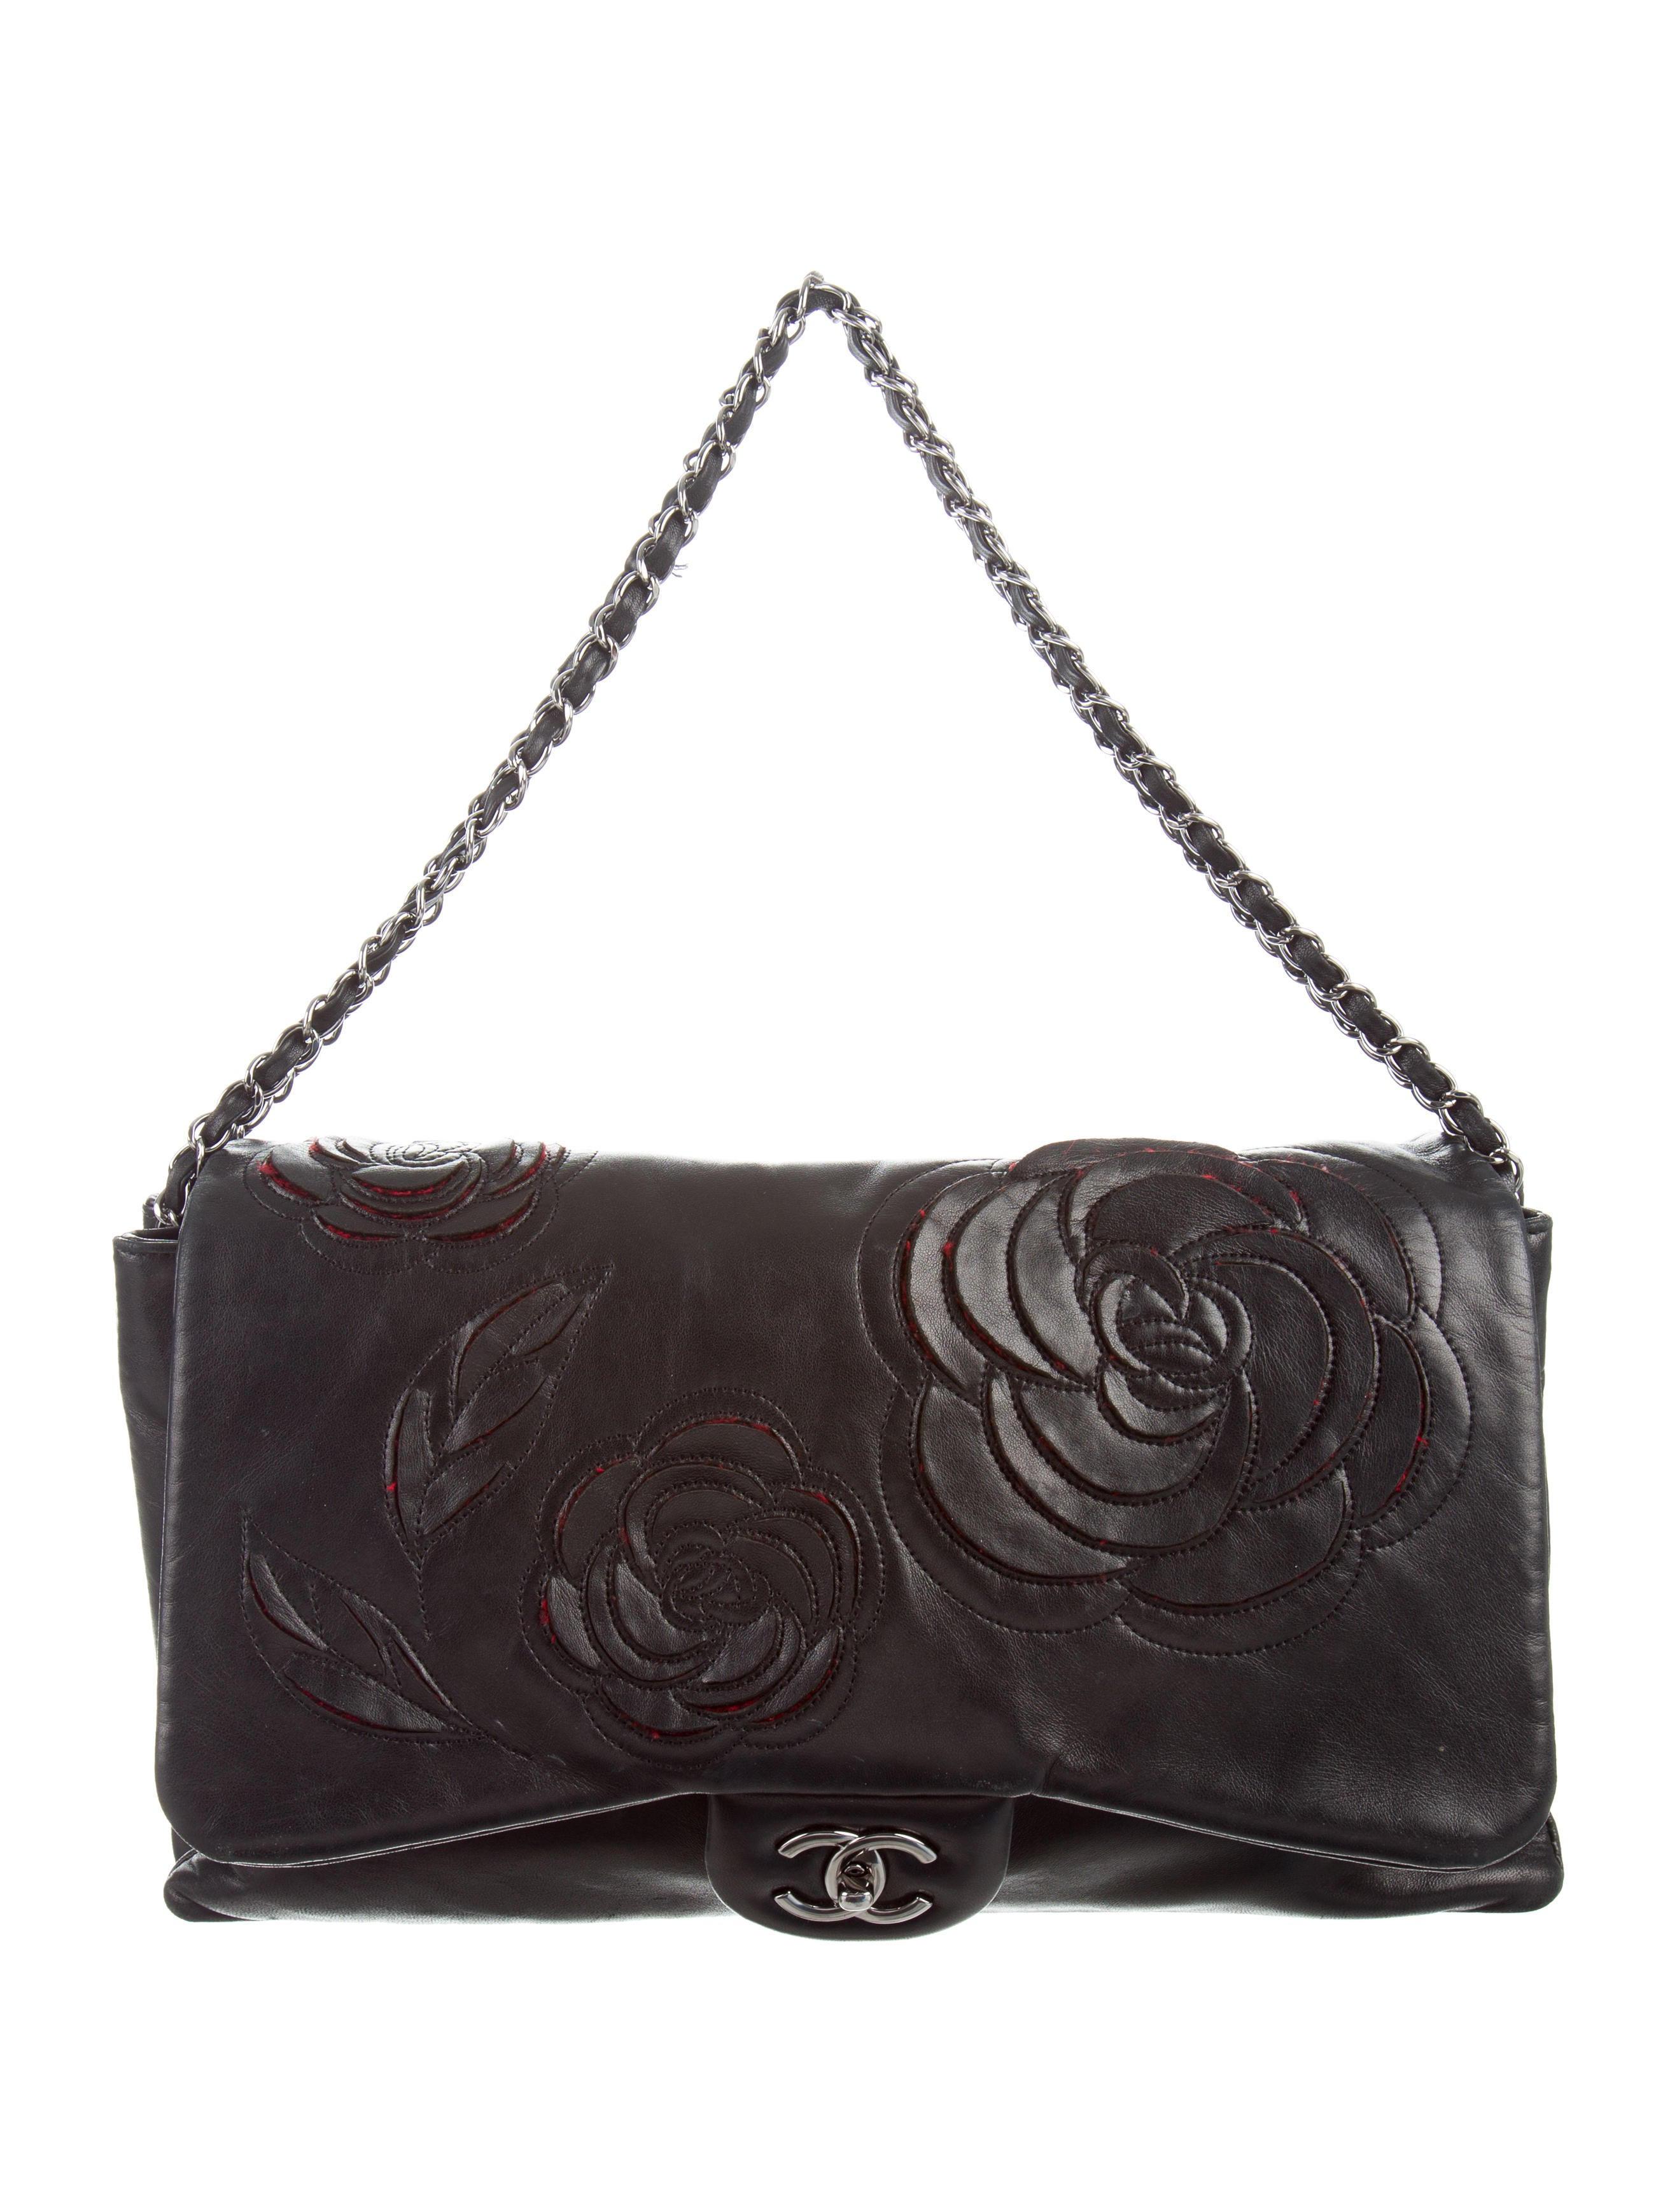 Chanel Petals Flap Bag - Handbags - CHA176038 | The RealReal